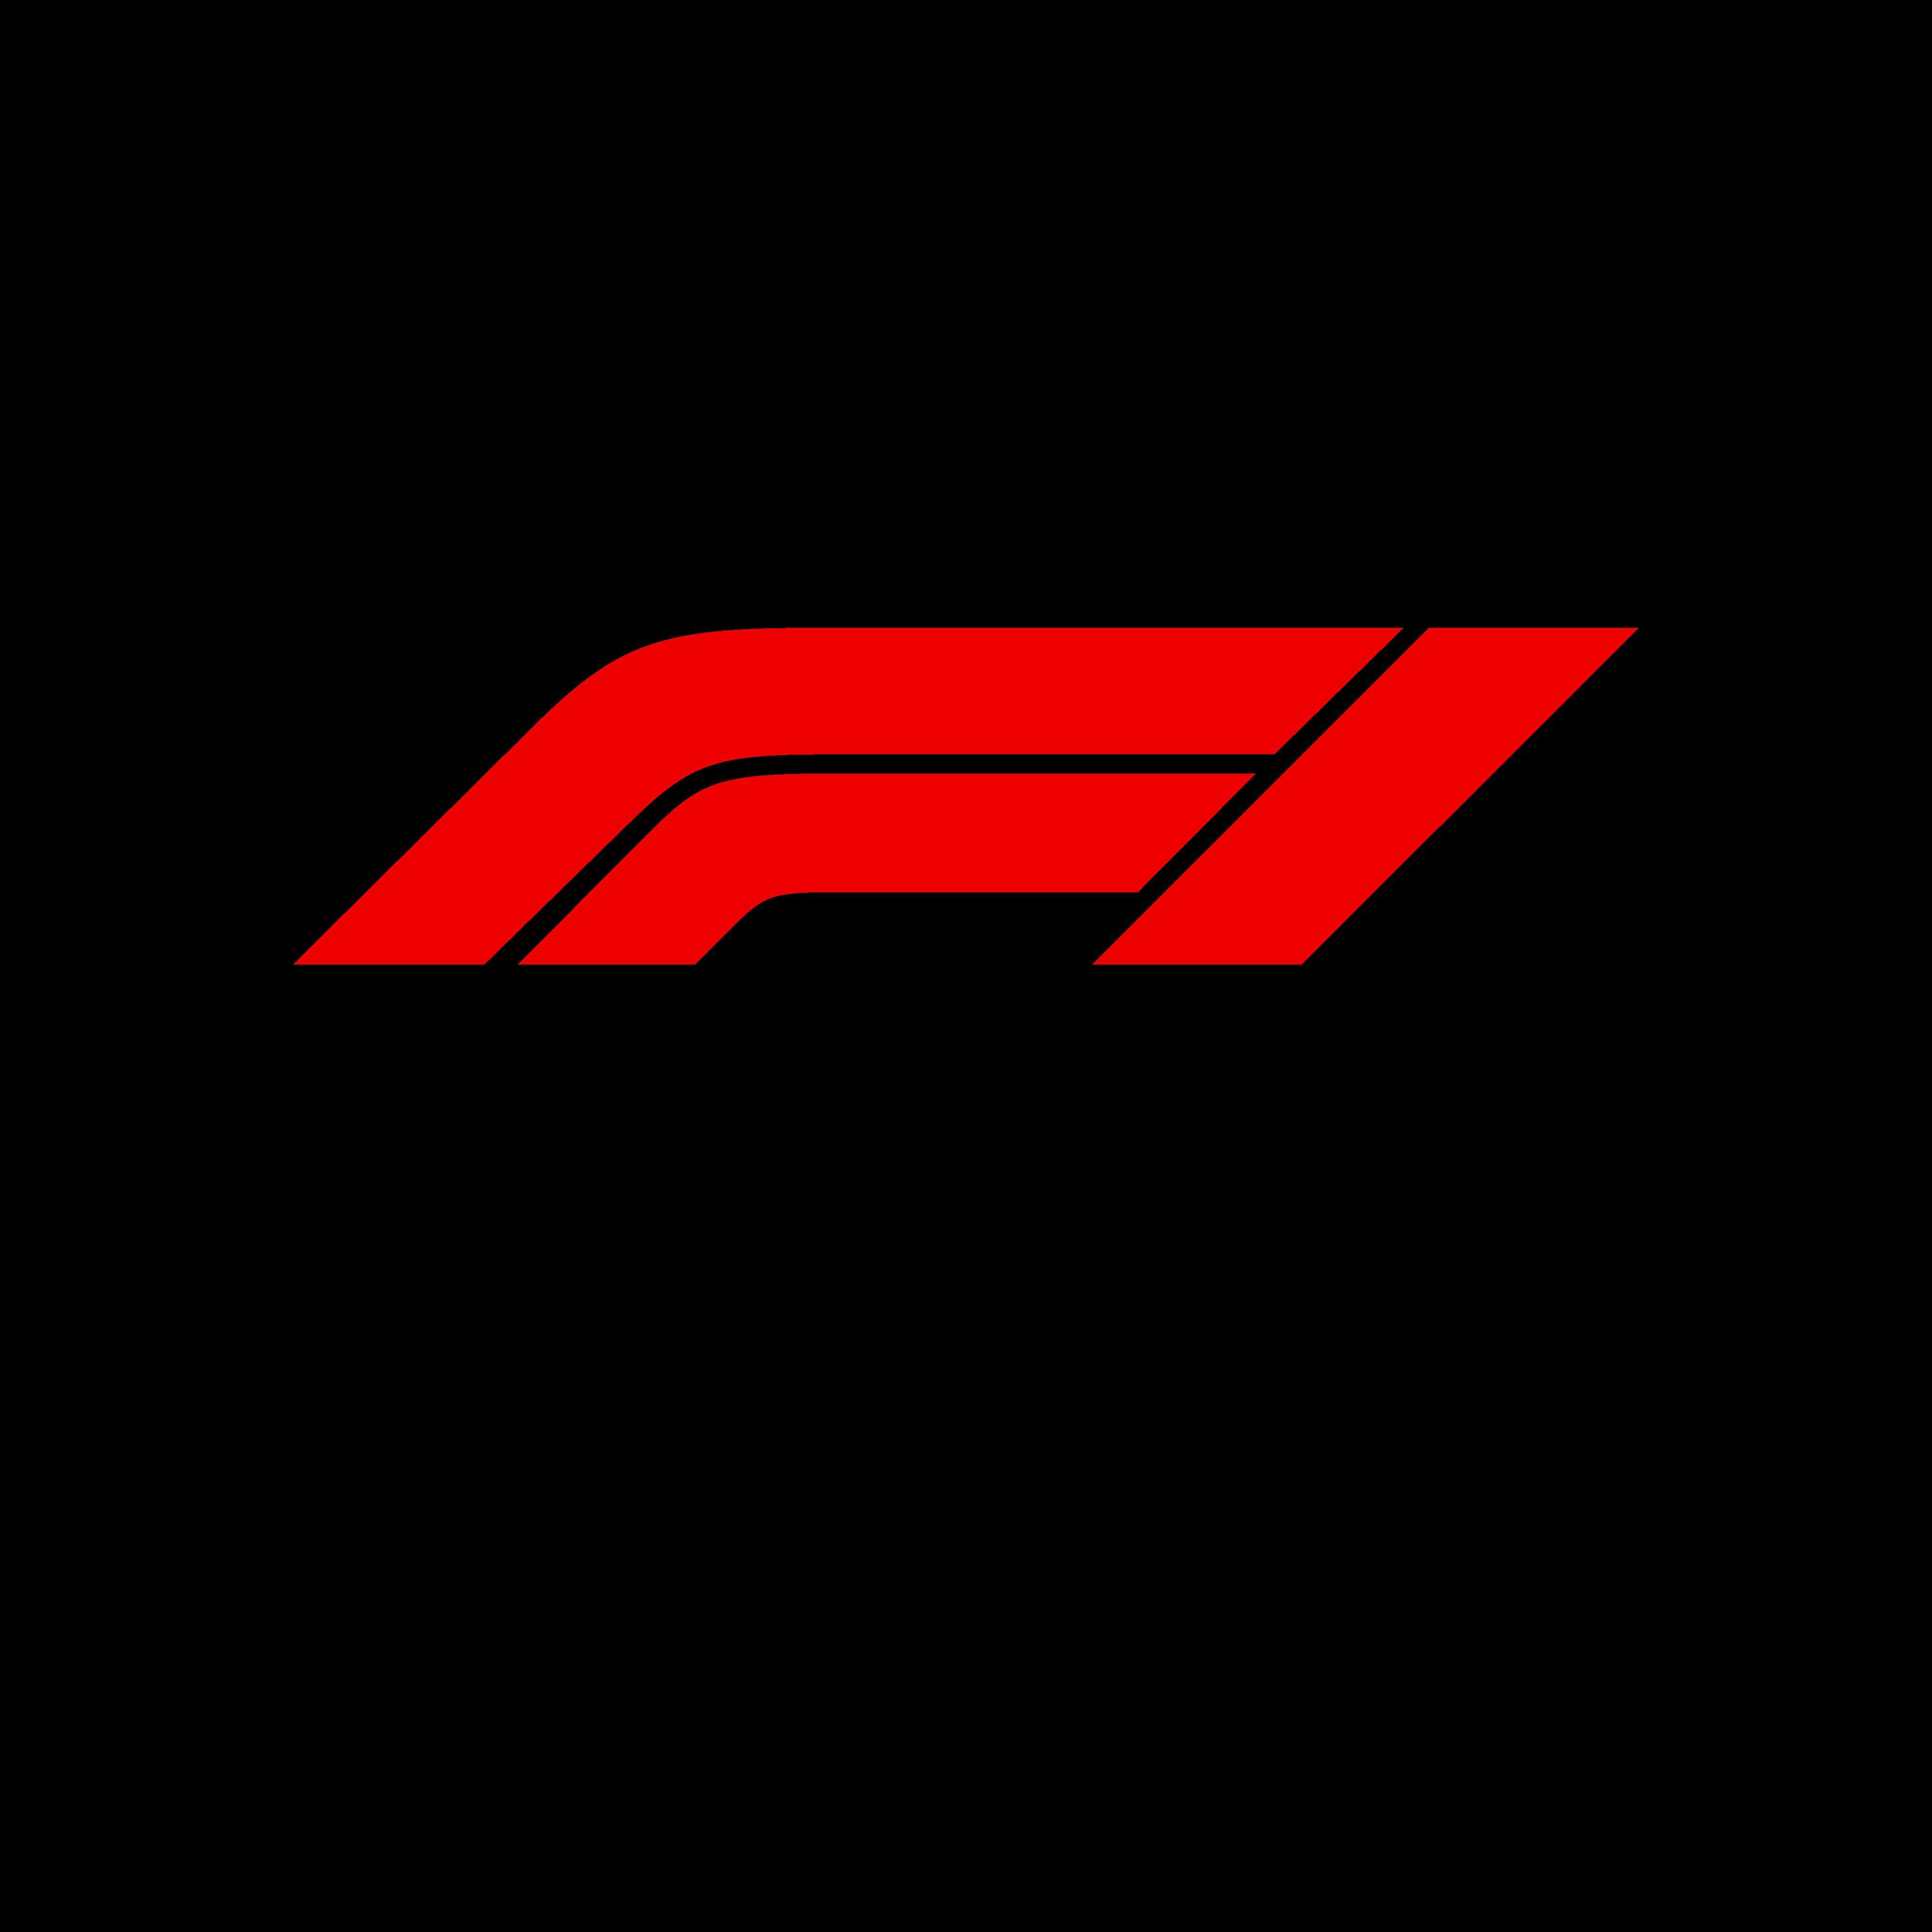 formula 1 logo 0 - Formula 1 Logo - F1 Logo